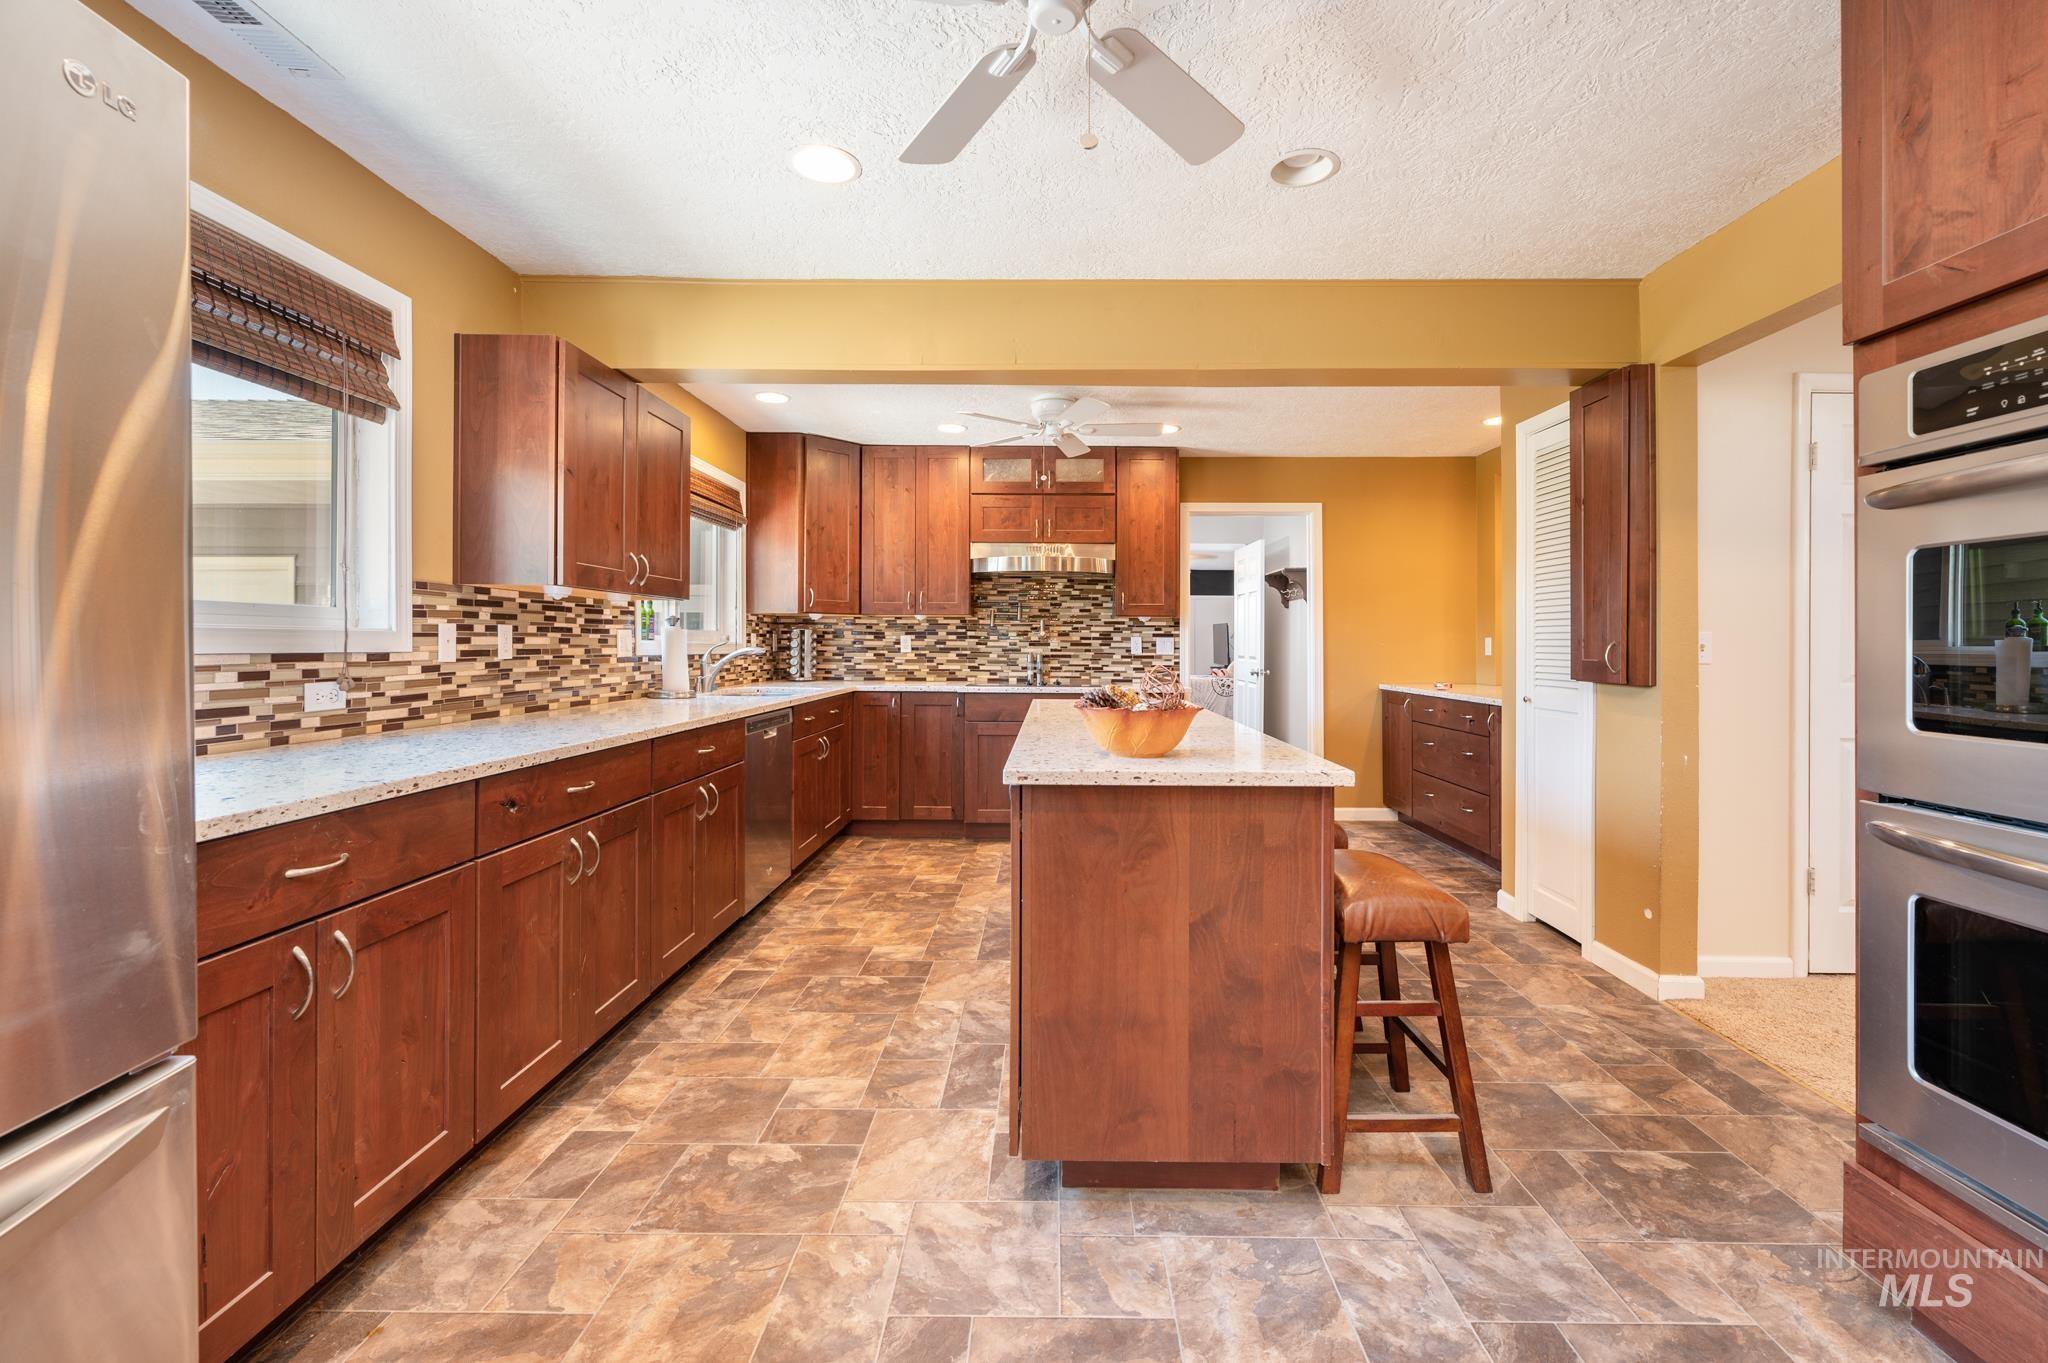 Desert View Est Real Estate Listings Main Image